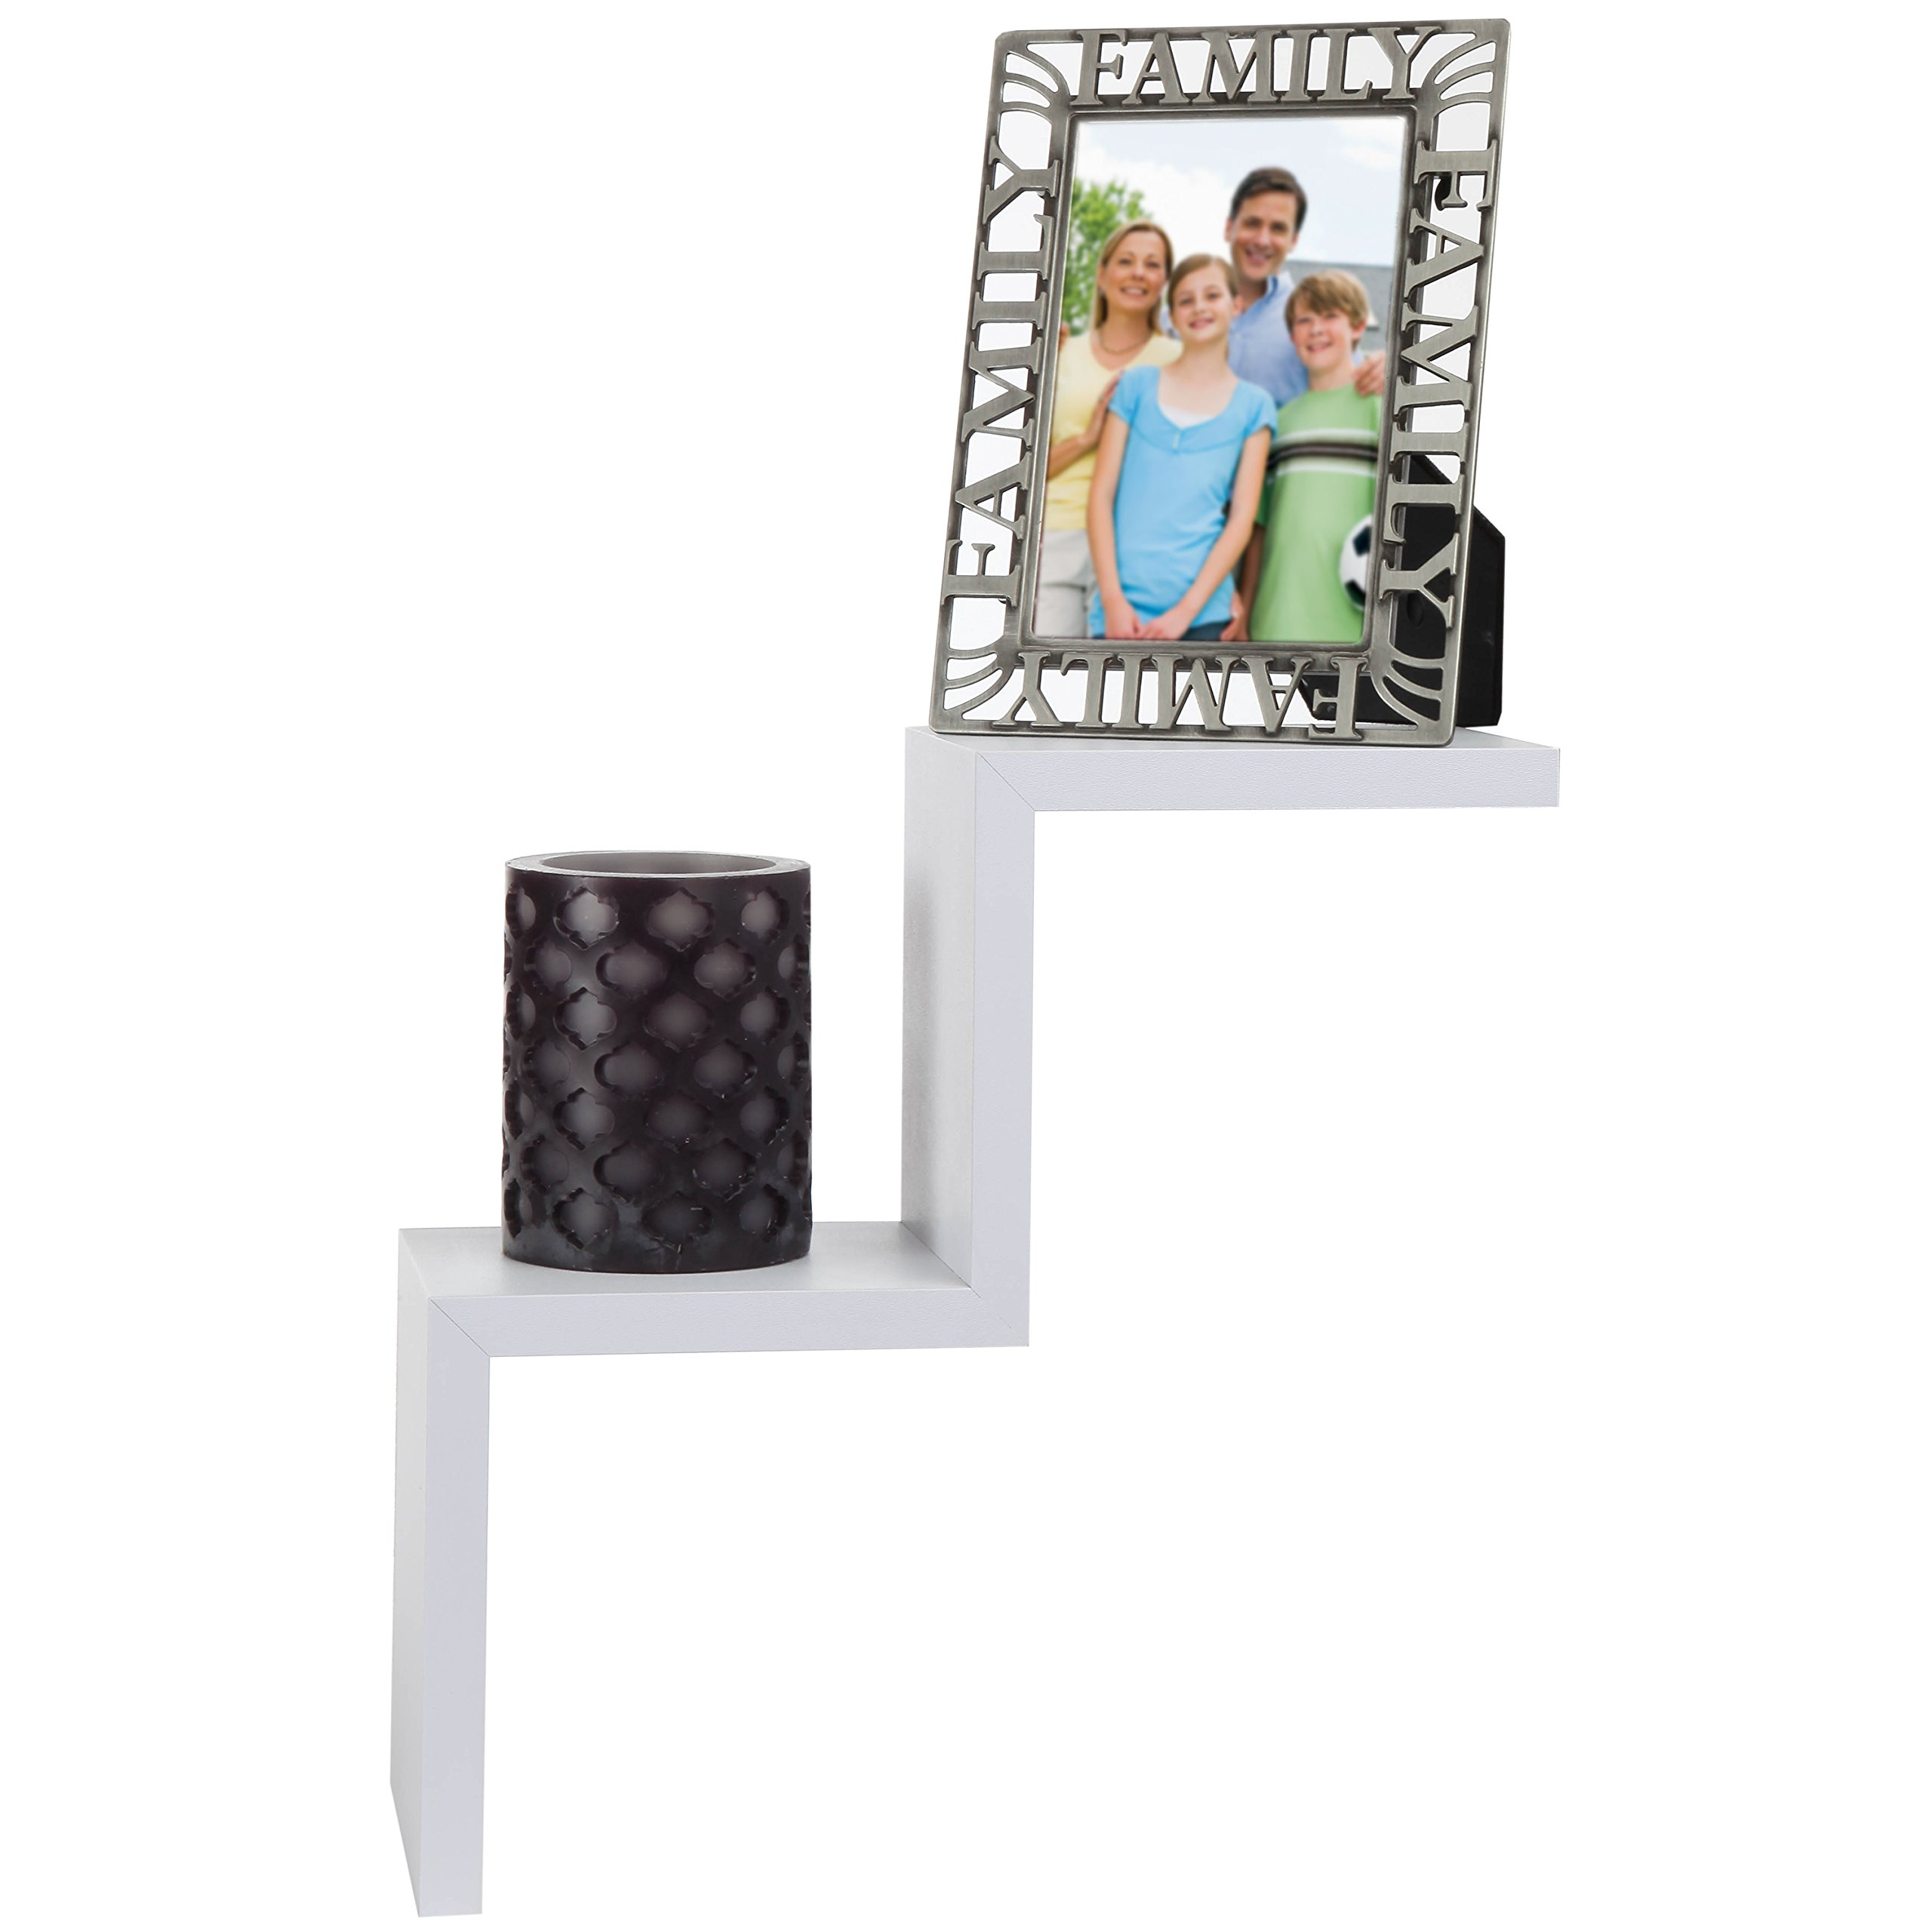 ARAD White 2 Steps Ladder Type Shaped Wall Shelf